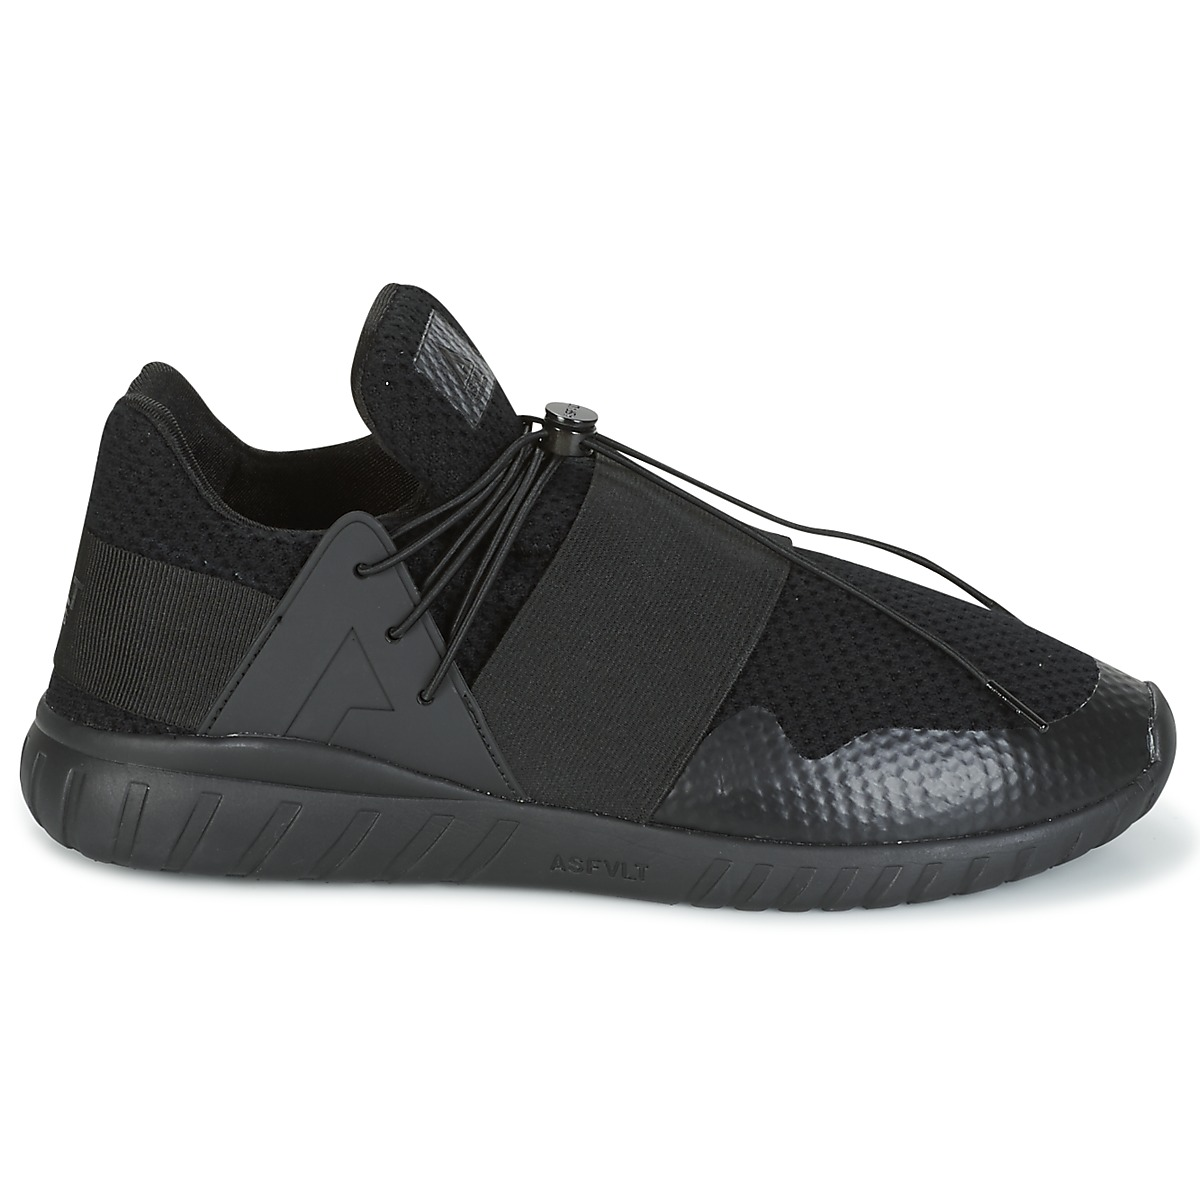 Asfvlt Asfvlt Asfvlt EVOLUTION MID Negro - Envío gratis Nueva promoción - Zapatos Deportivas bajas Hombre 85f44f